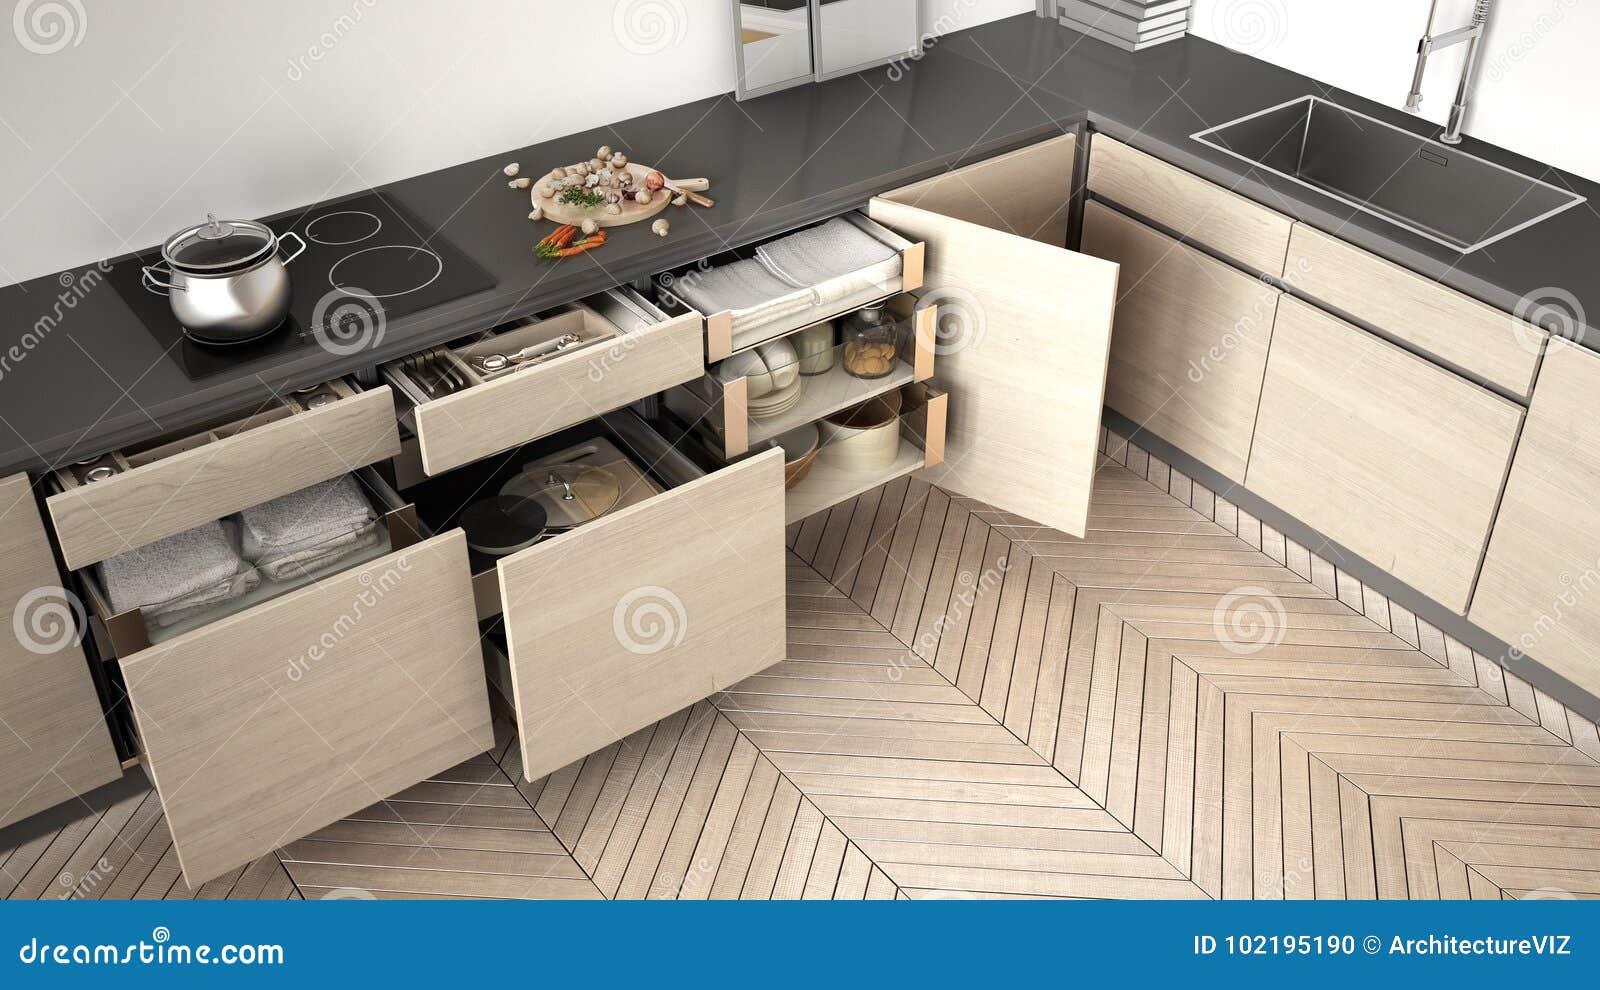 Accessori Per Cucina Moderna.Vista Superiore Della Cucina Moderna Cassetti Di Legno